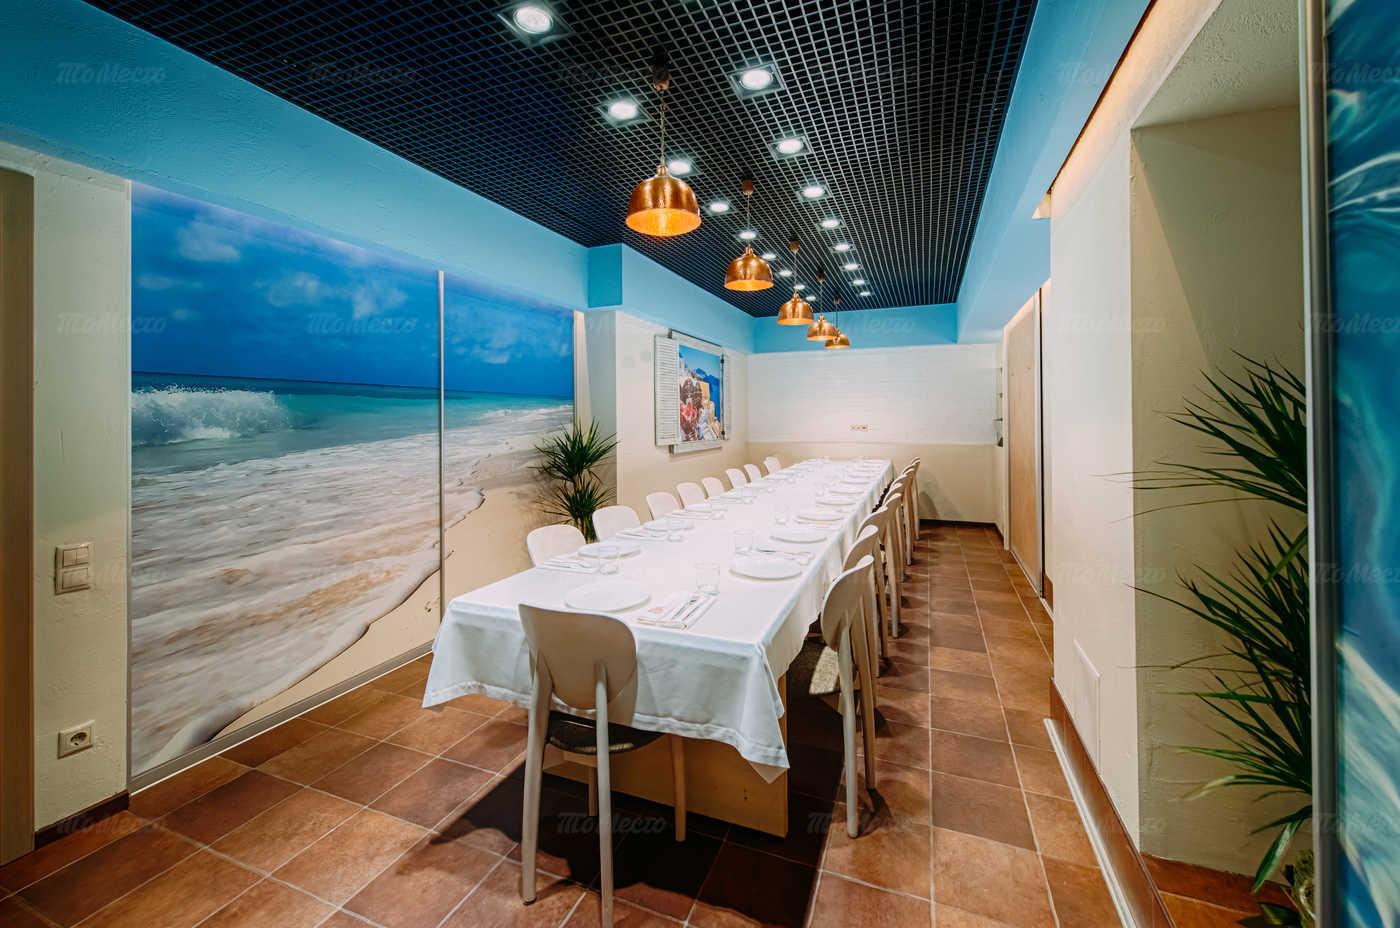 Меню ресторана Pomegranate Premium на Новочеркасском проспекте